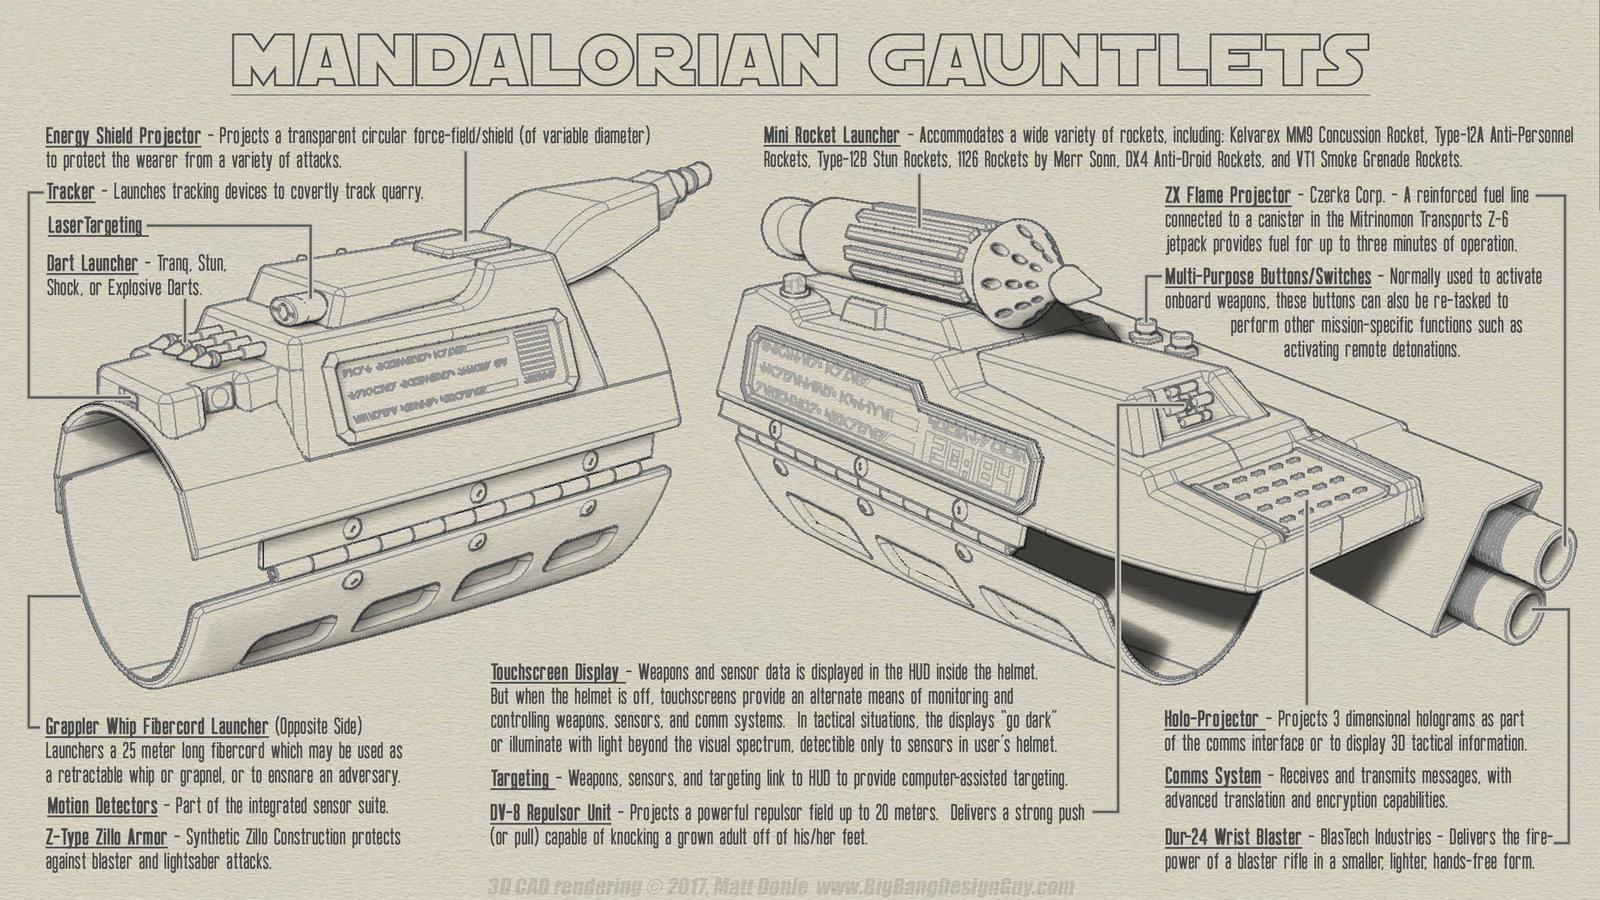 Mandalorian Gauntlet Vambrace Sketches By Ravendeviant On Deviantart